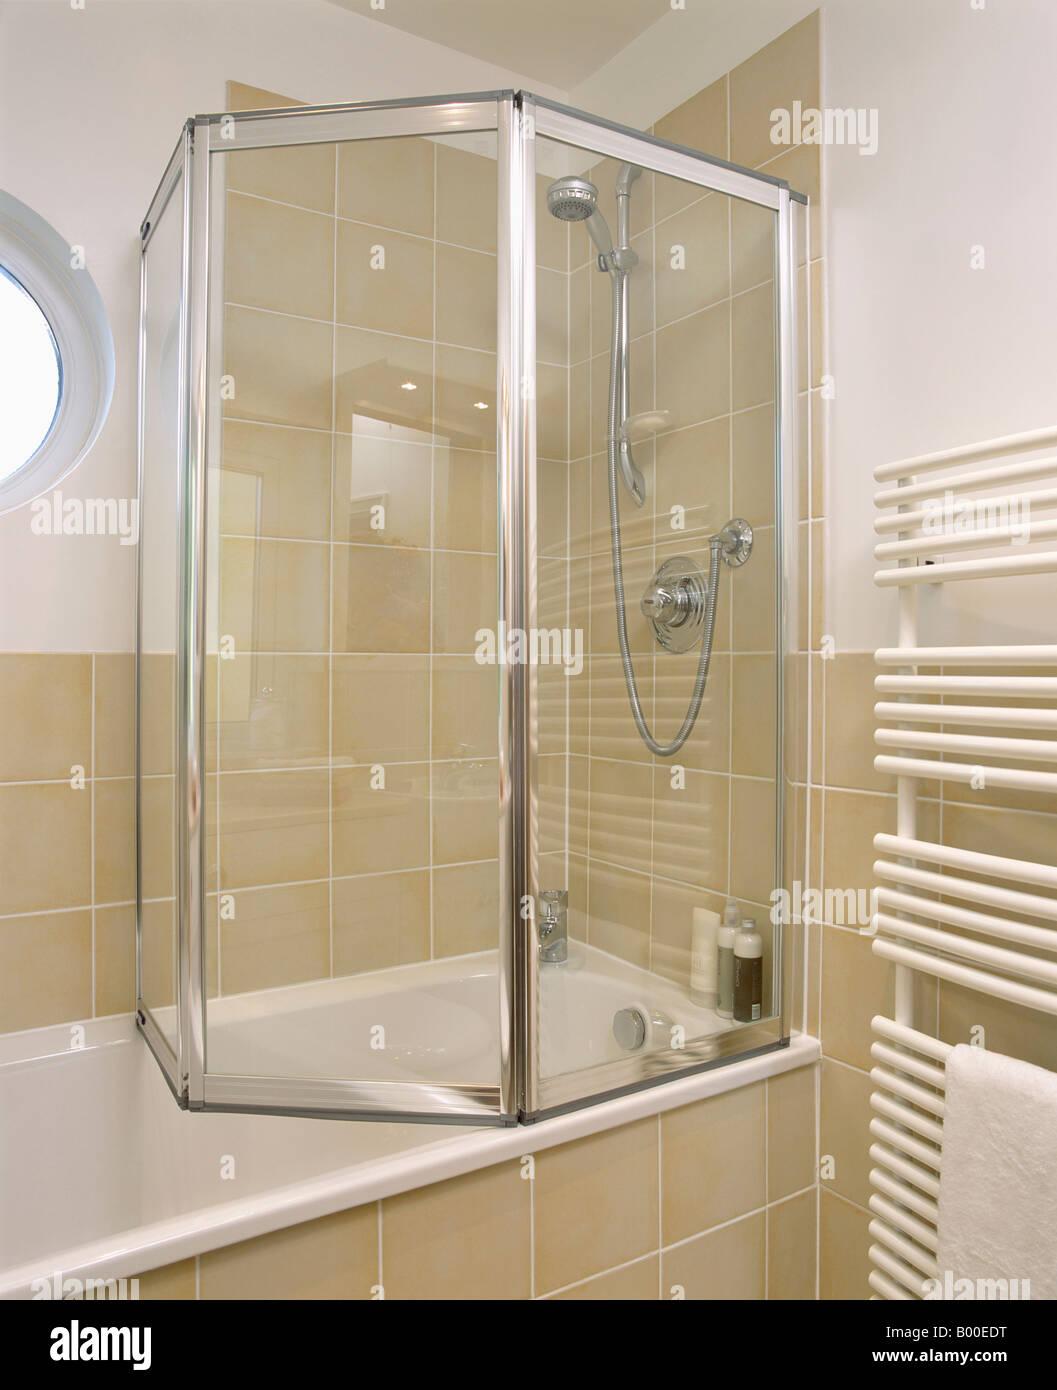 Folding Glass Shower Doors On Bath In Modern Bathroom With